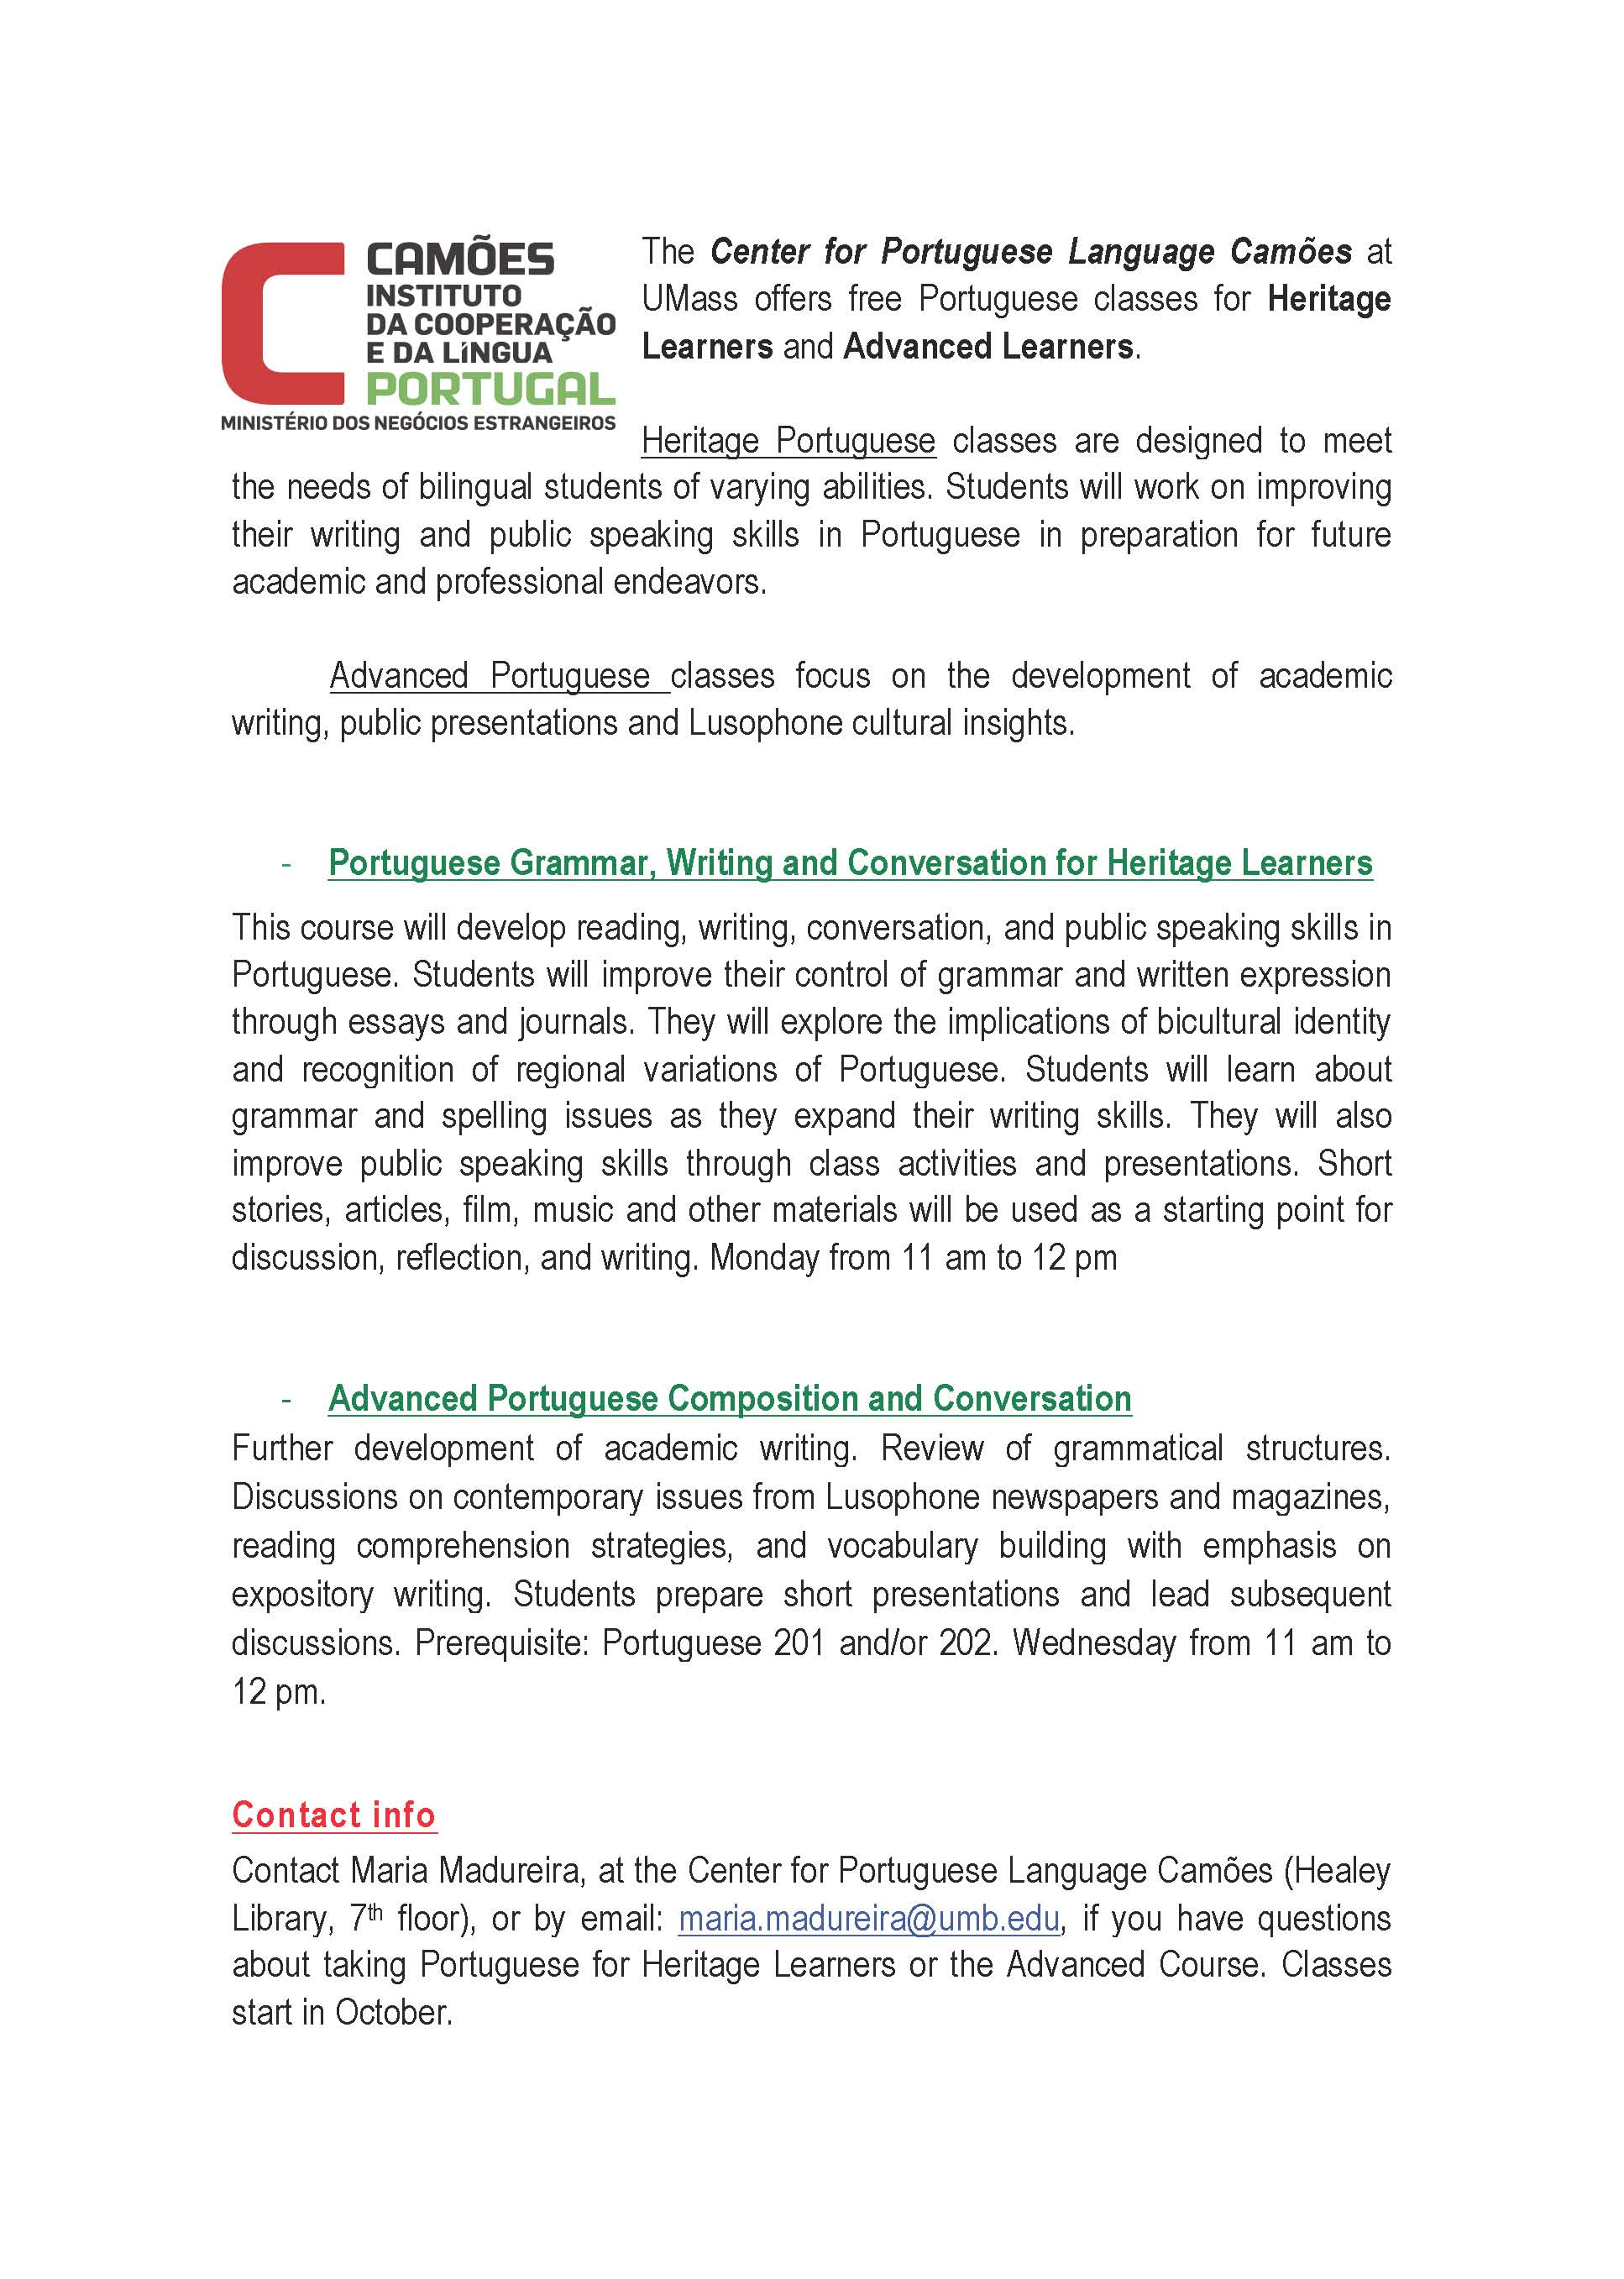 The Center for Portuguese Language Camões - free classes